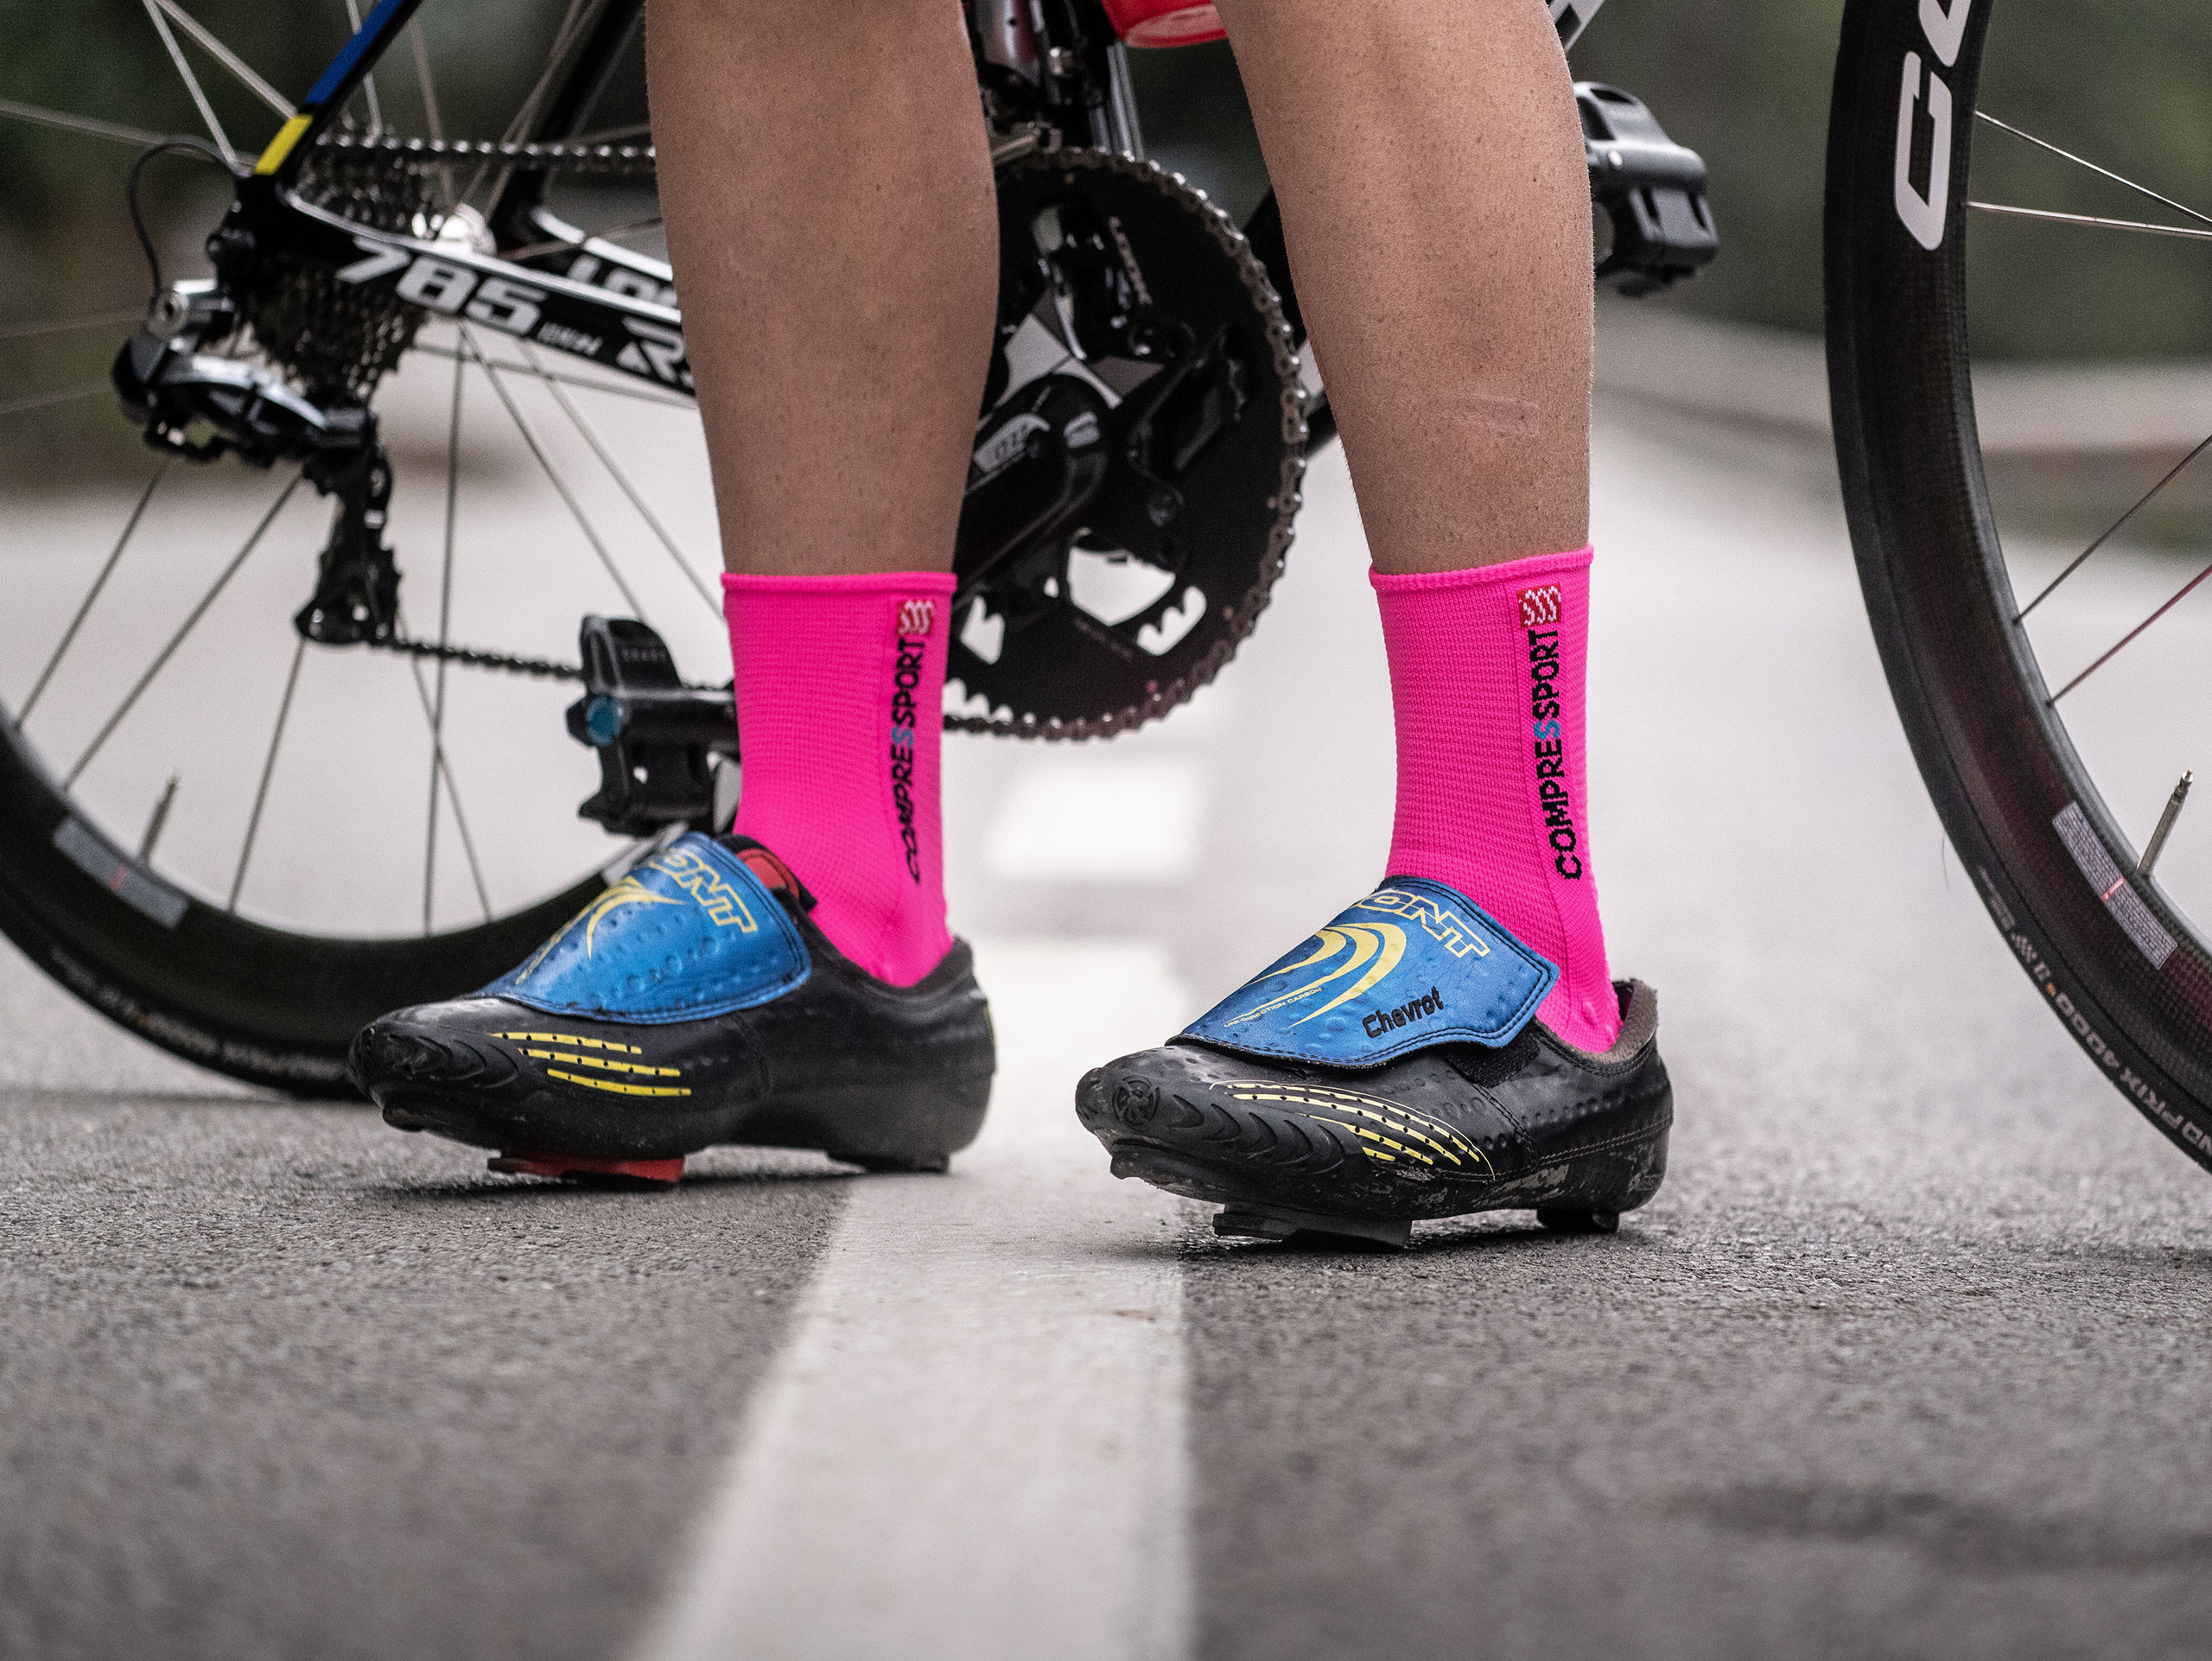 Pro Racing Socks v3.0 Bike neonpink